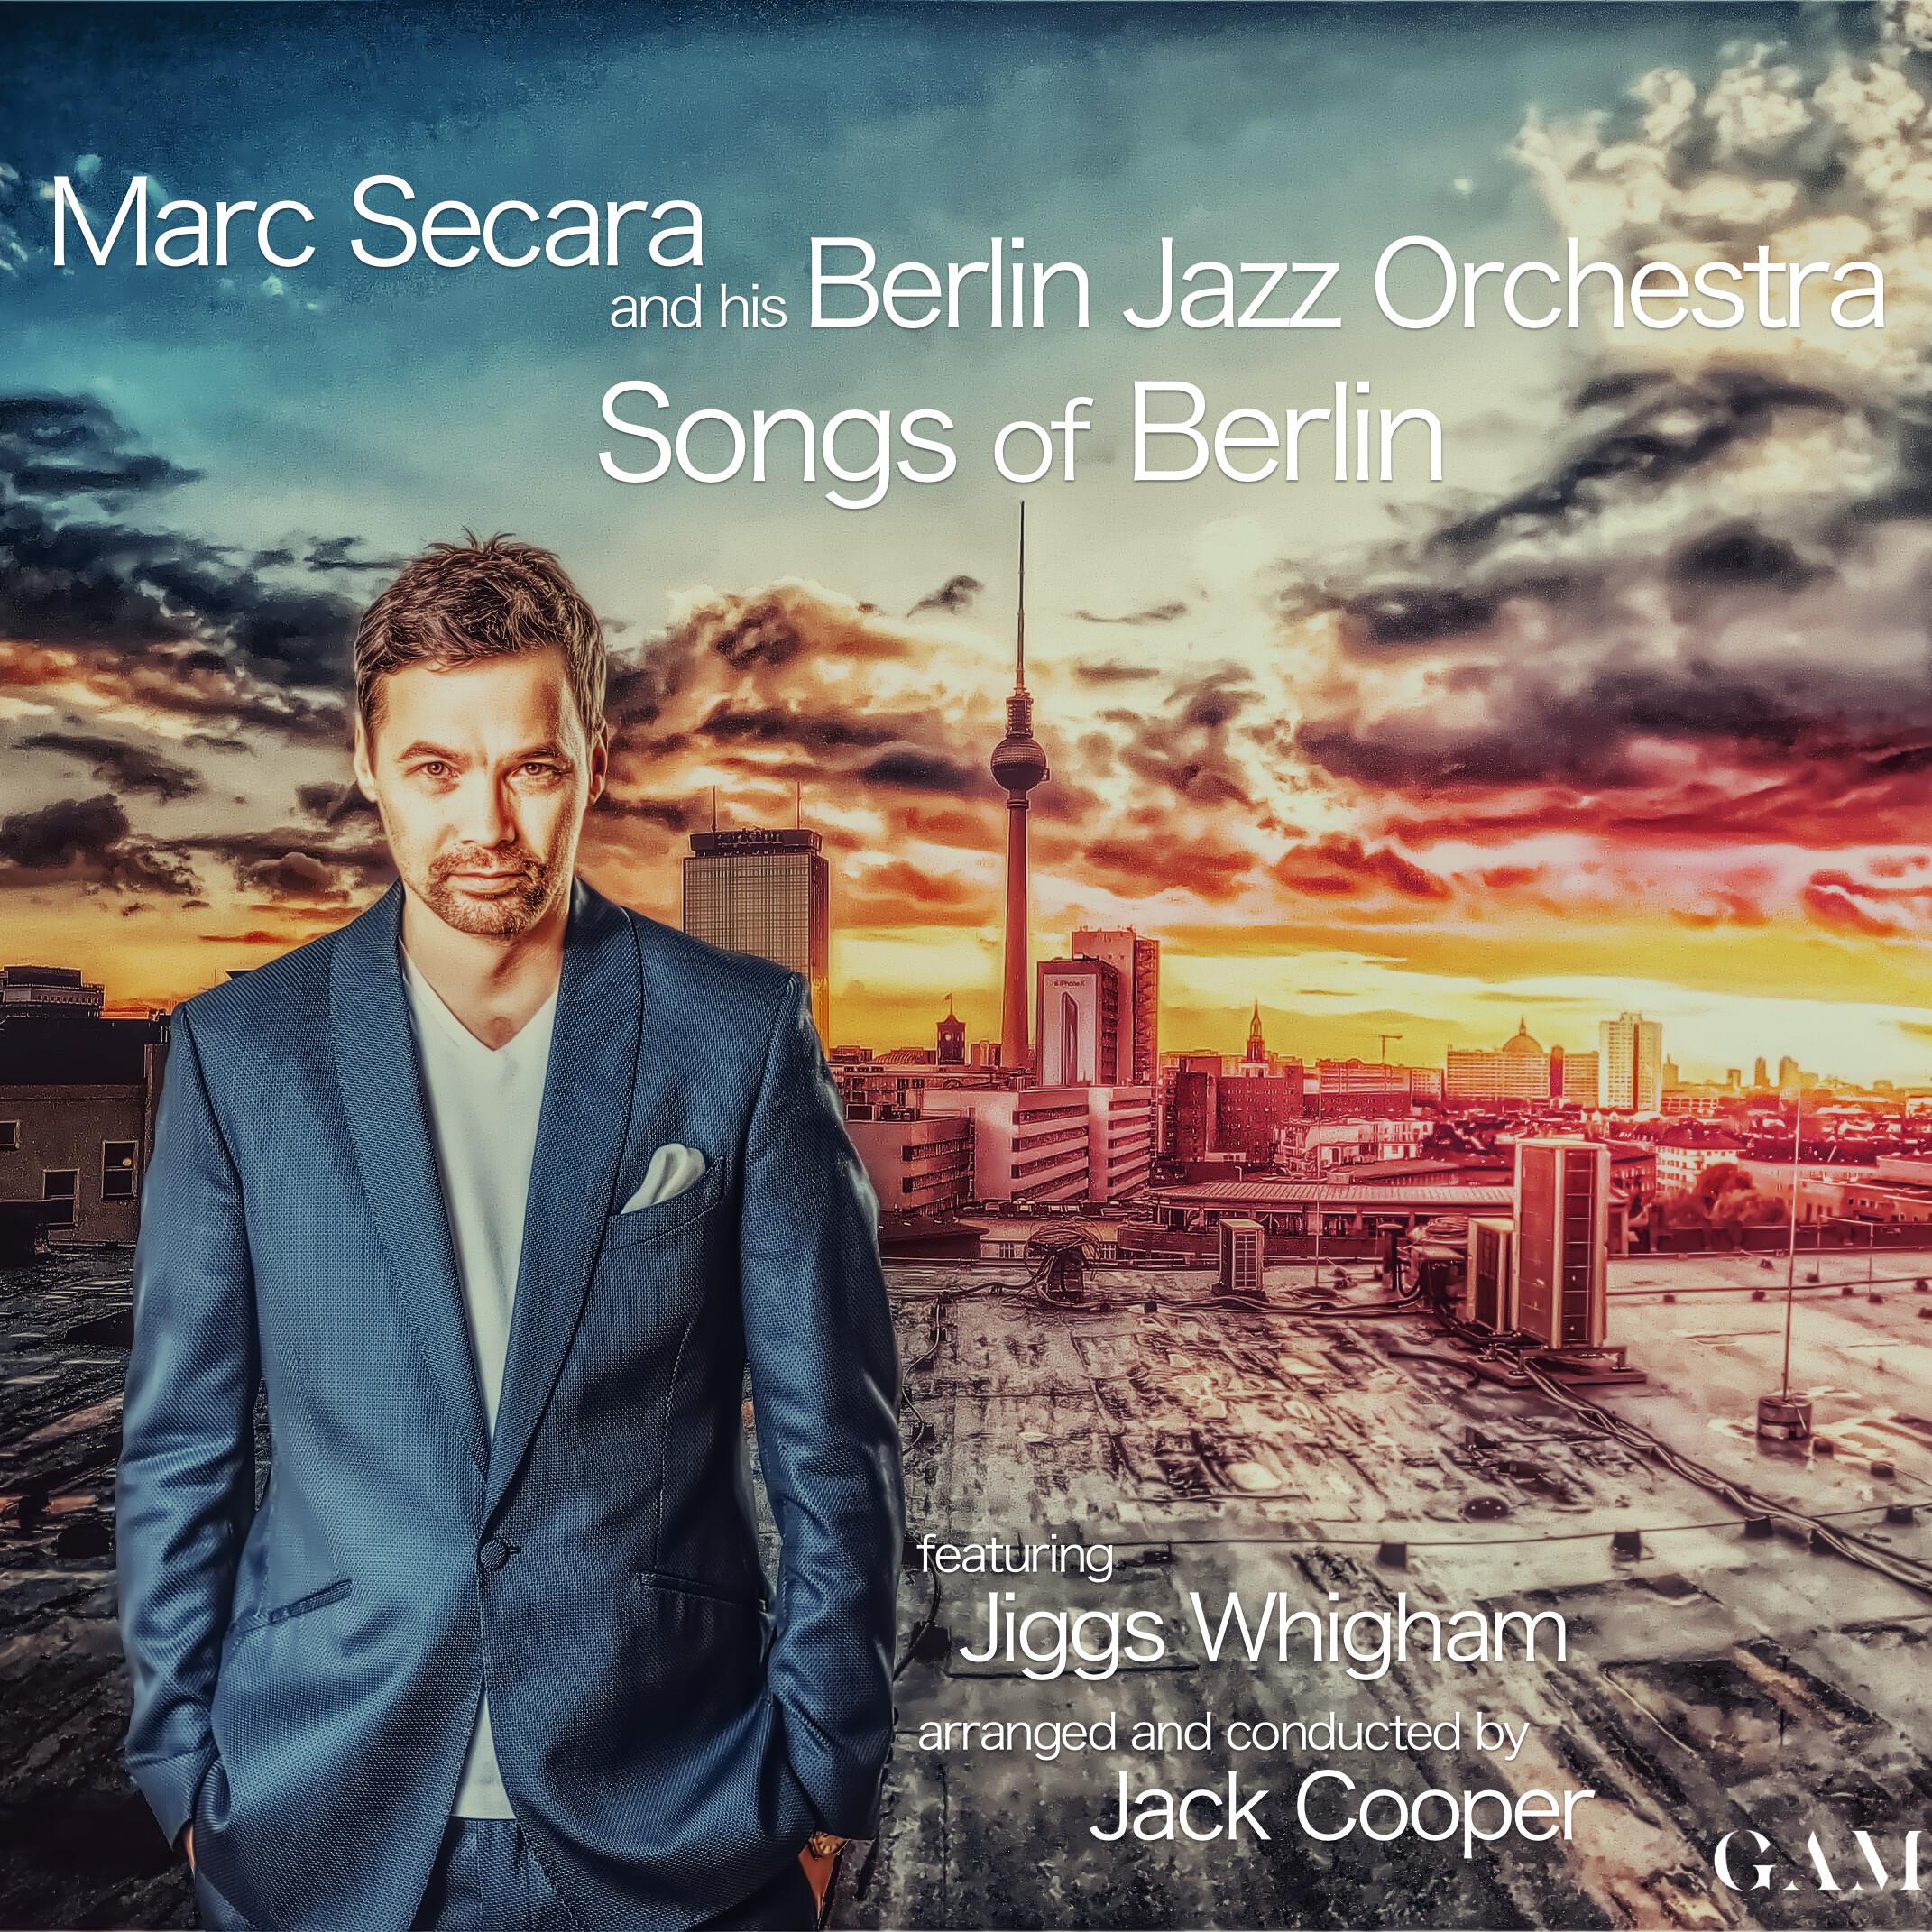 Album Songs of Berlin - Berlin Jazz Orchestra feat. Marc Secara - GAM Music